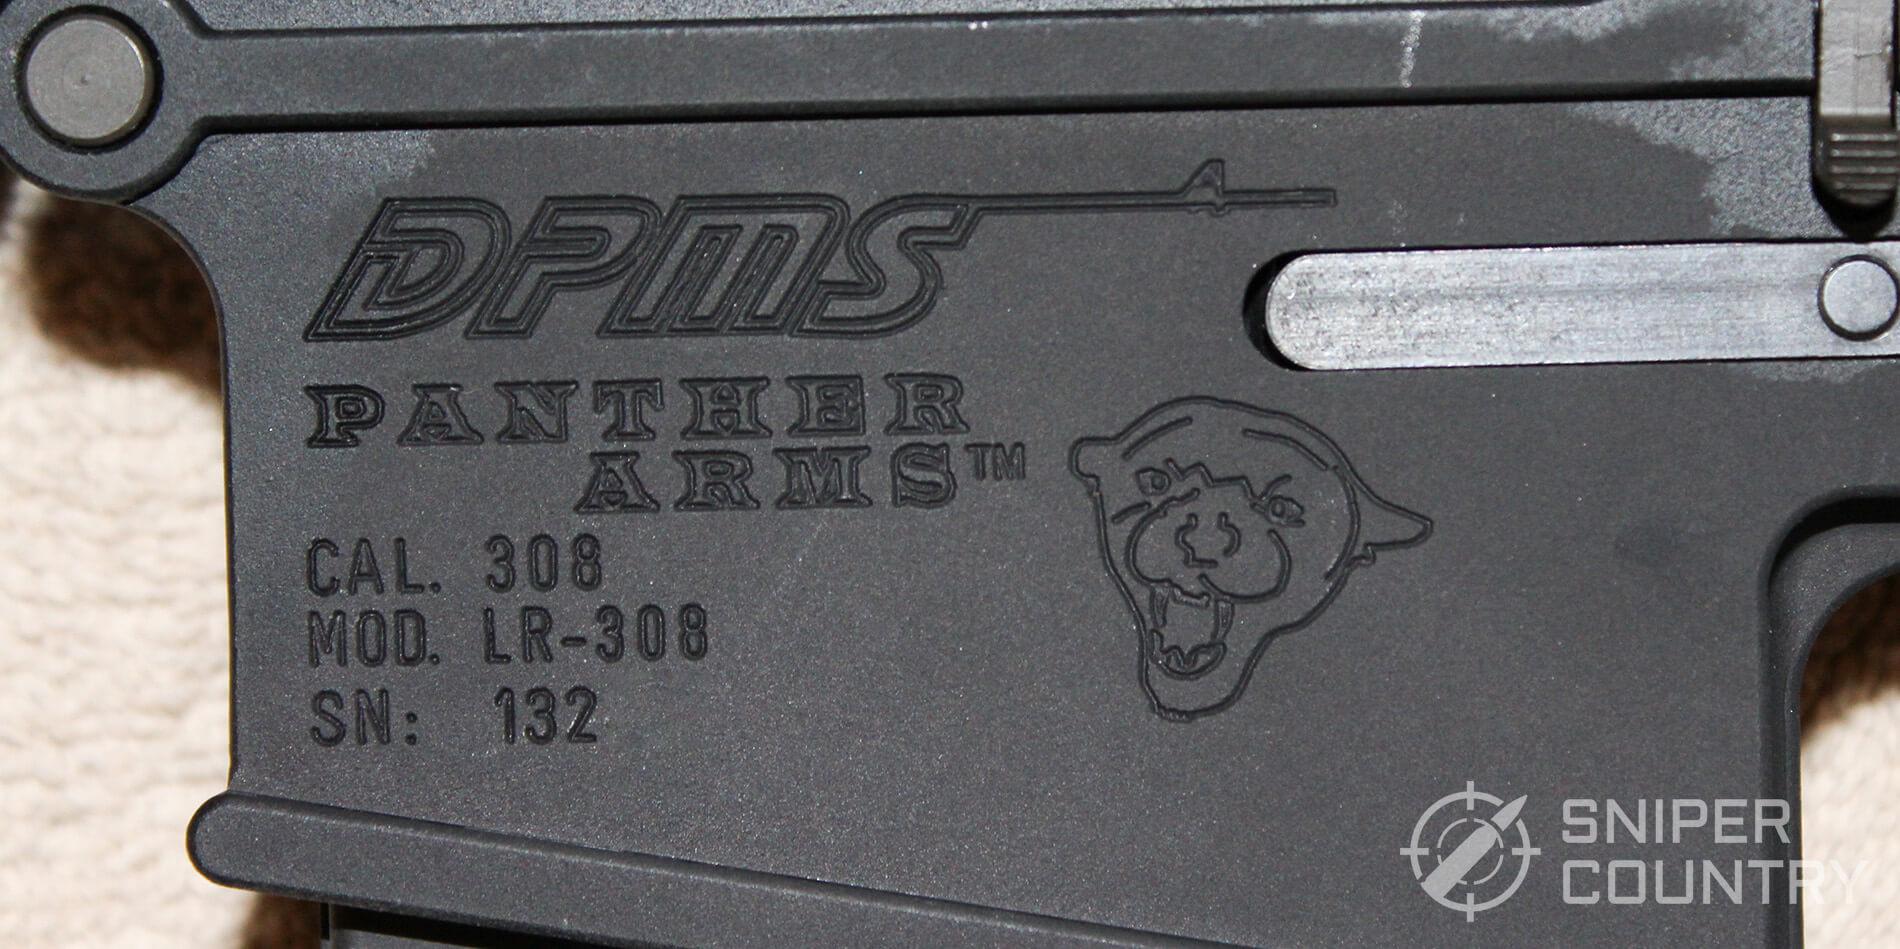 DPMS LR-308 receiver engraving